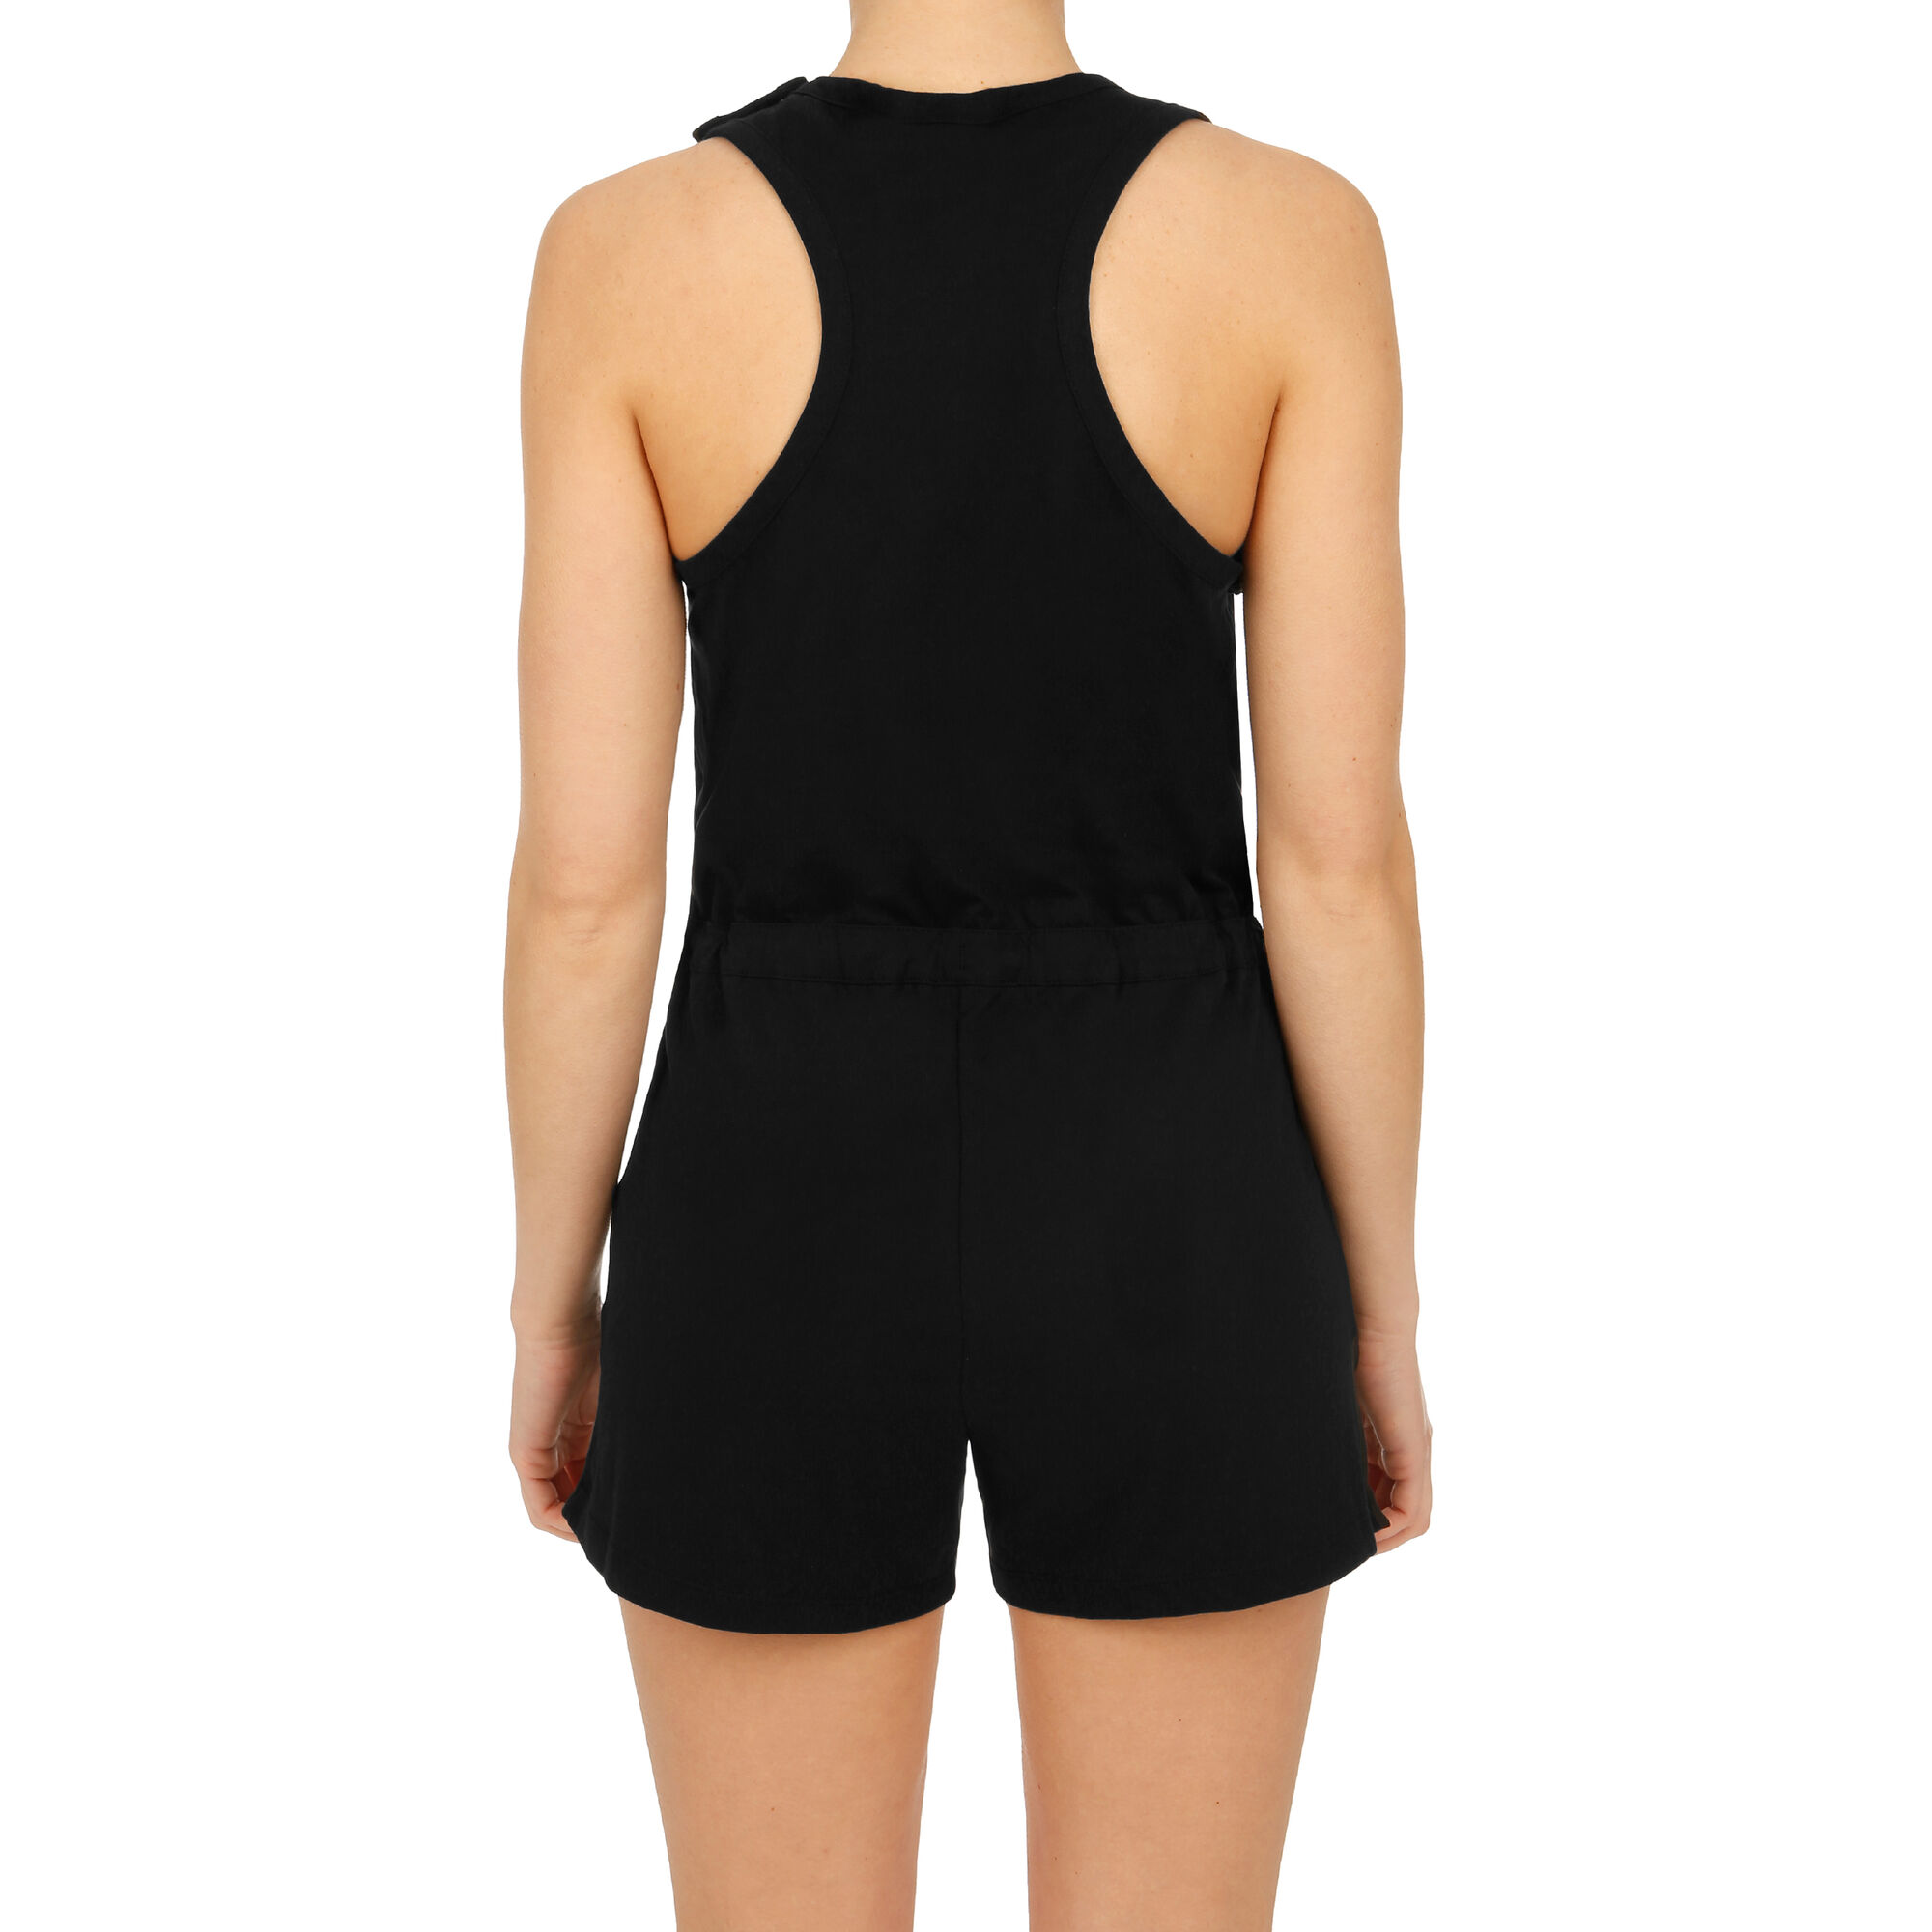 b32c0157df01f Nike Jumpsuit Womens Black And White | Lixnet AG